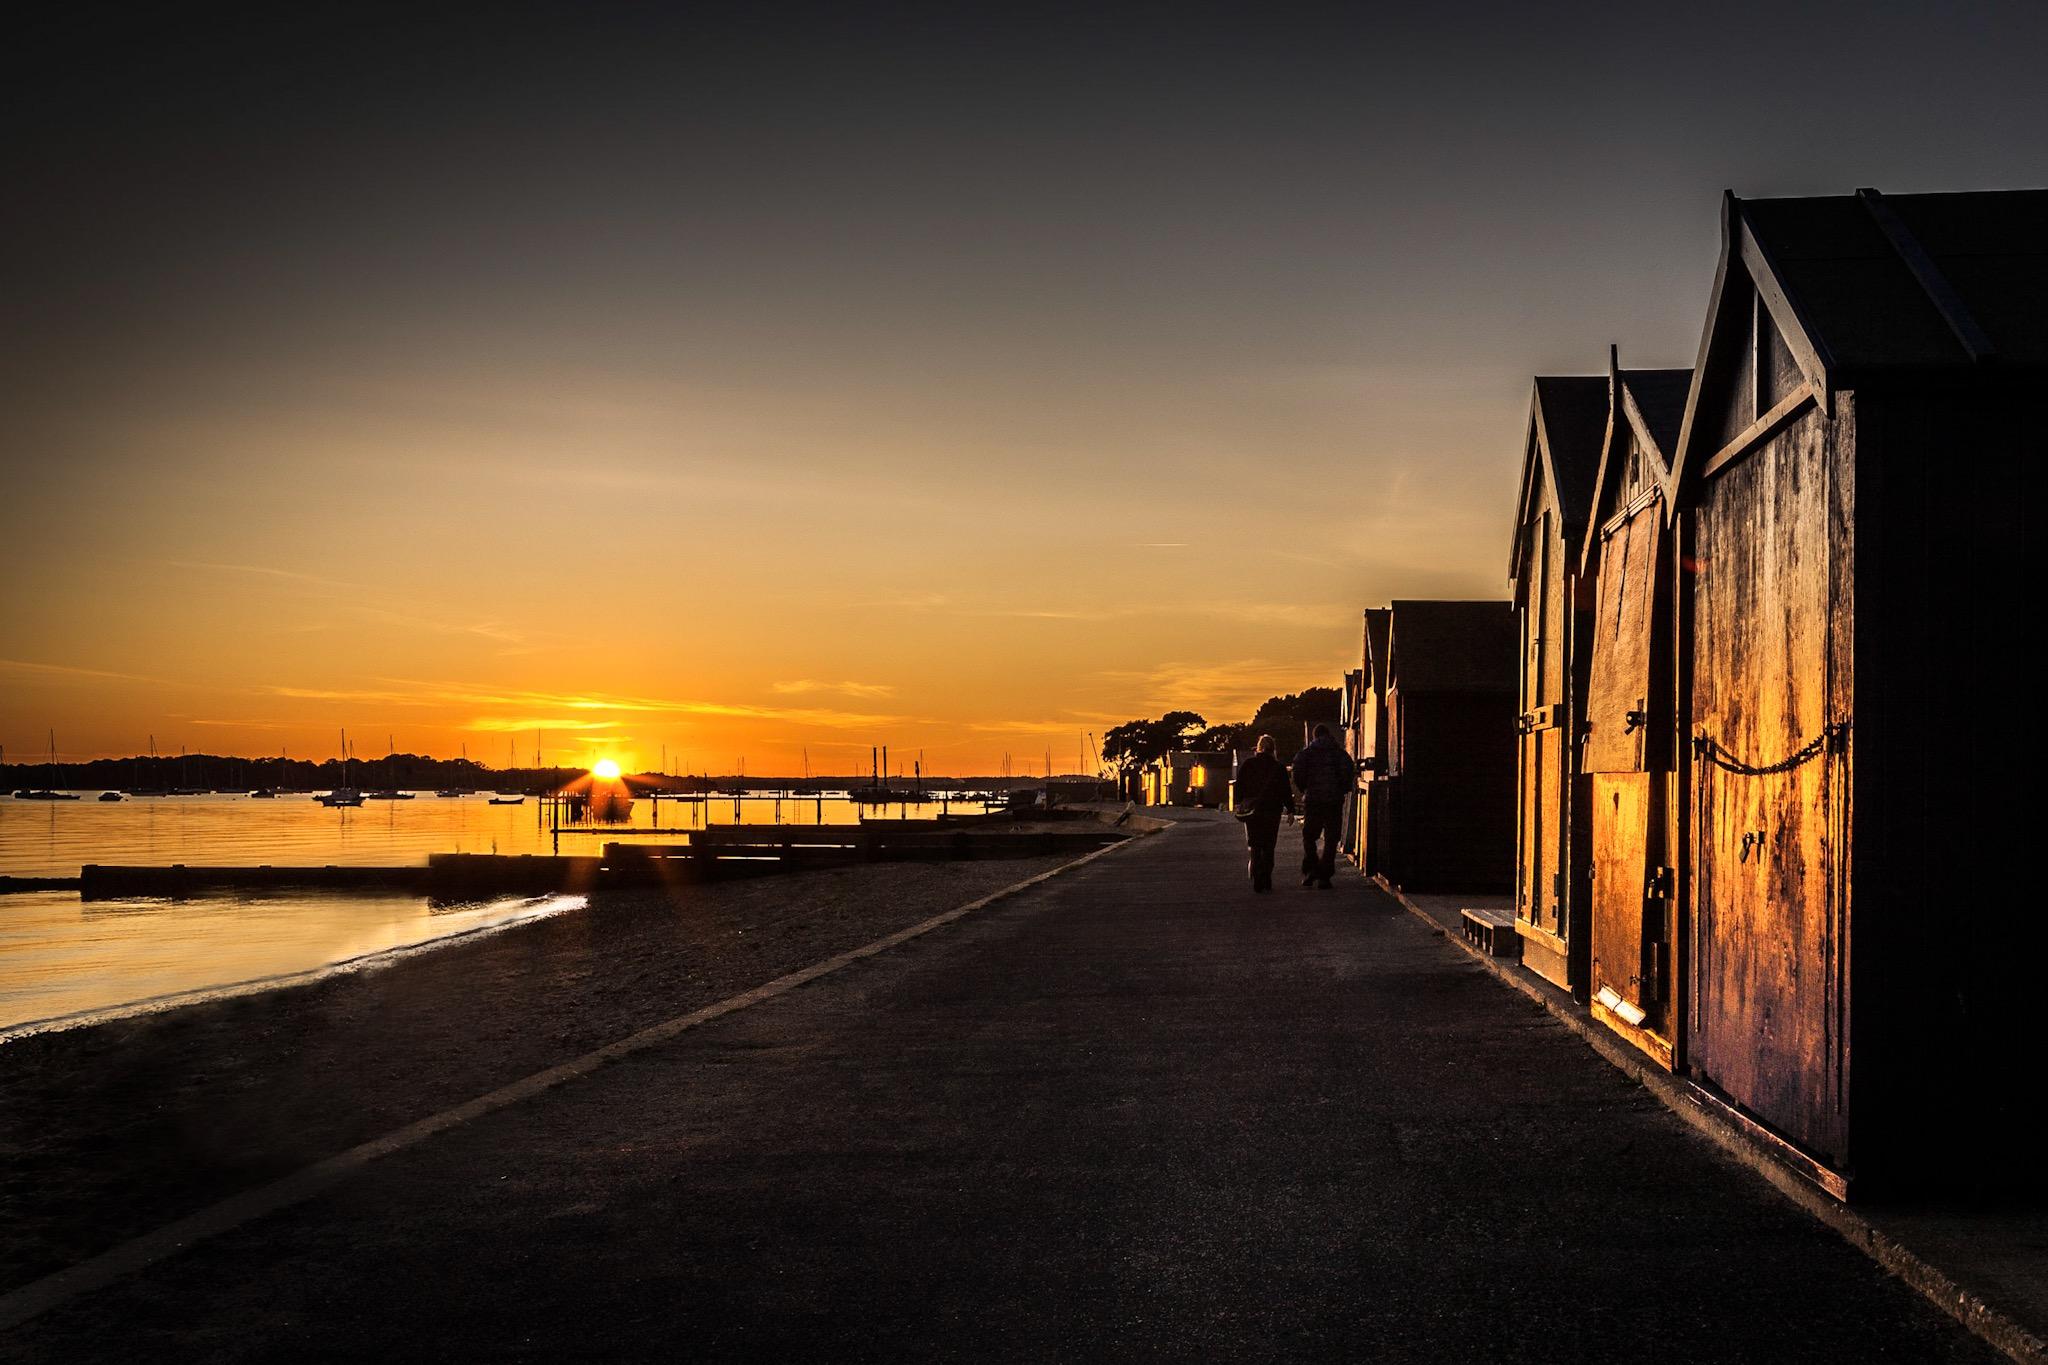 Hamworthy Beach Huts at sunset by Rick McEvoy Poole Photographer